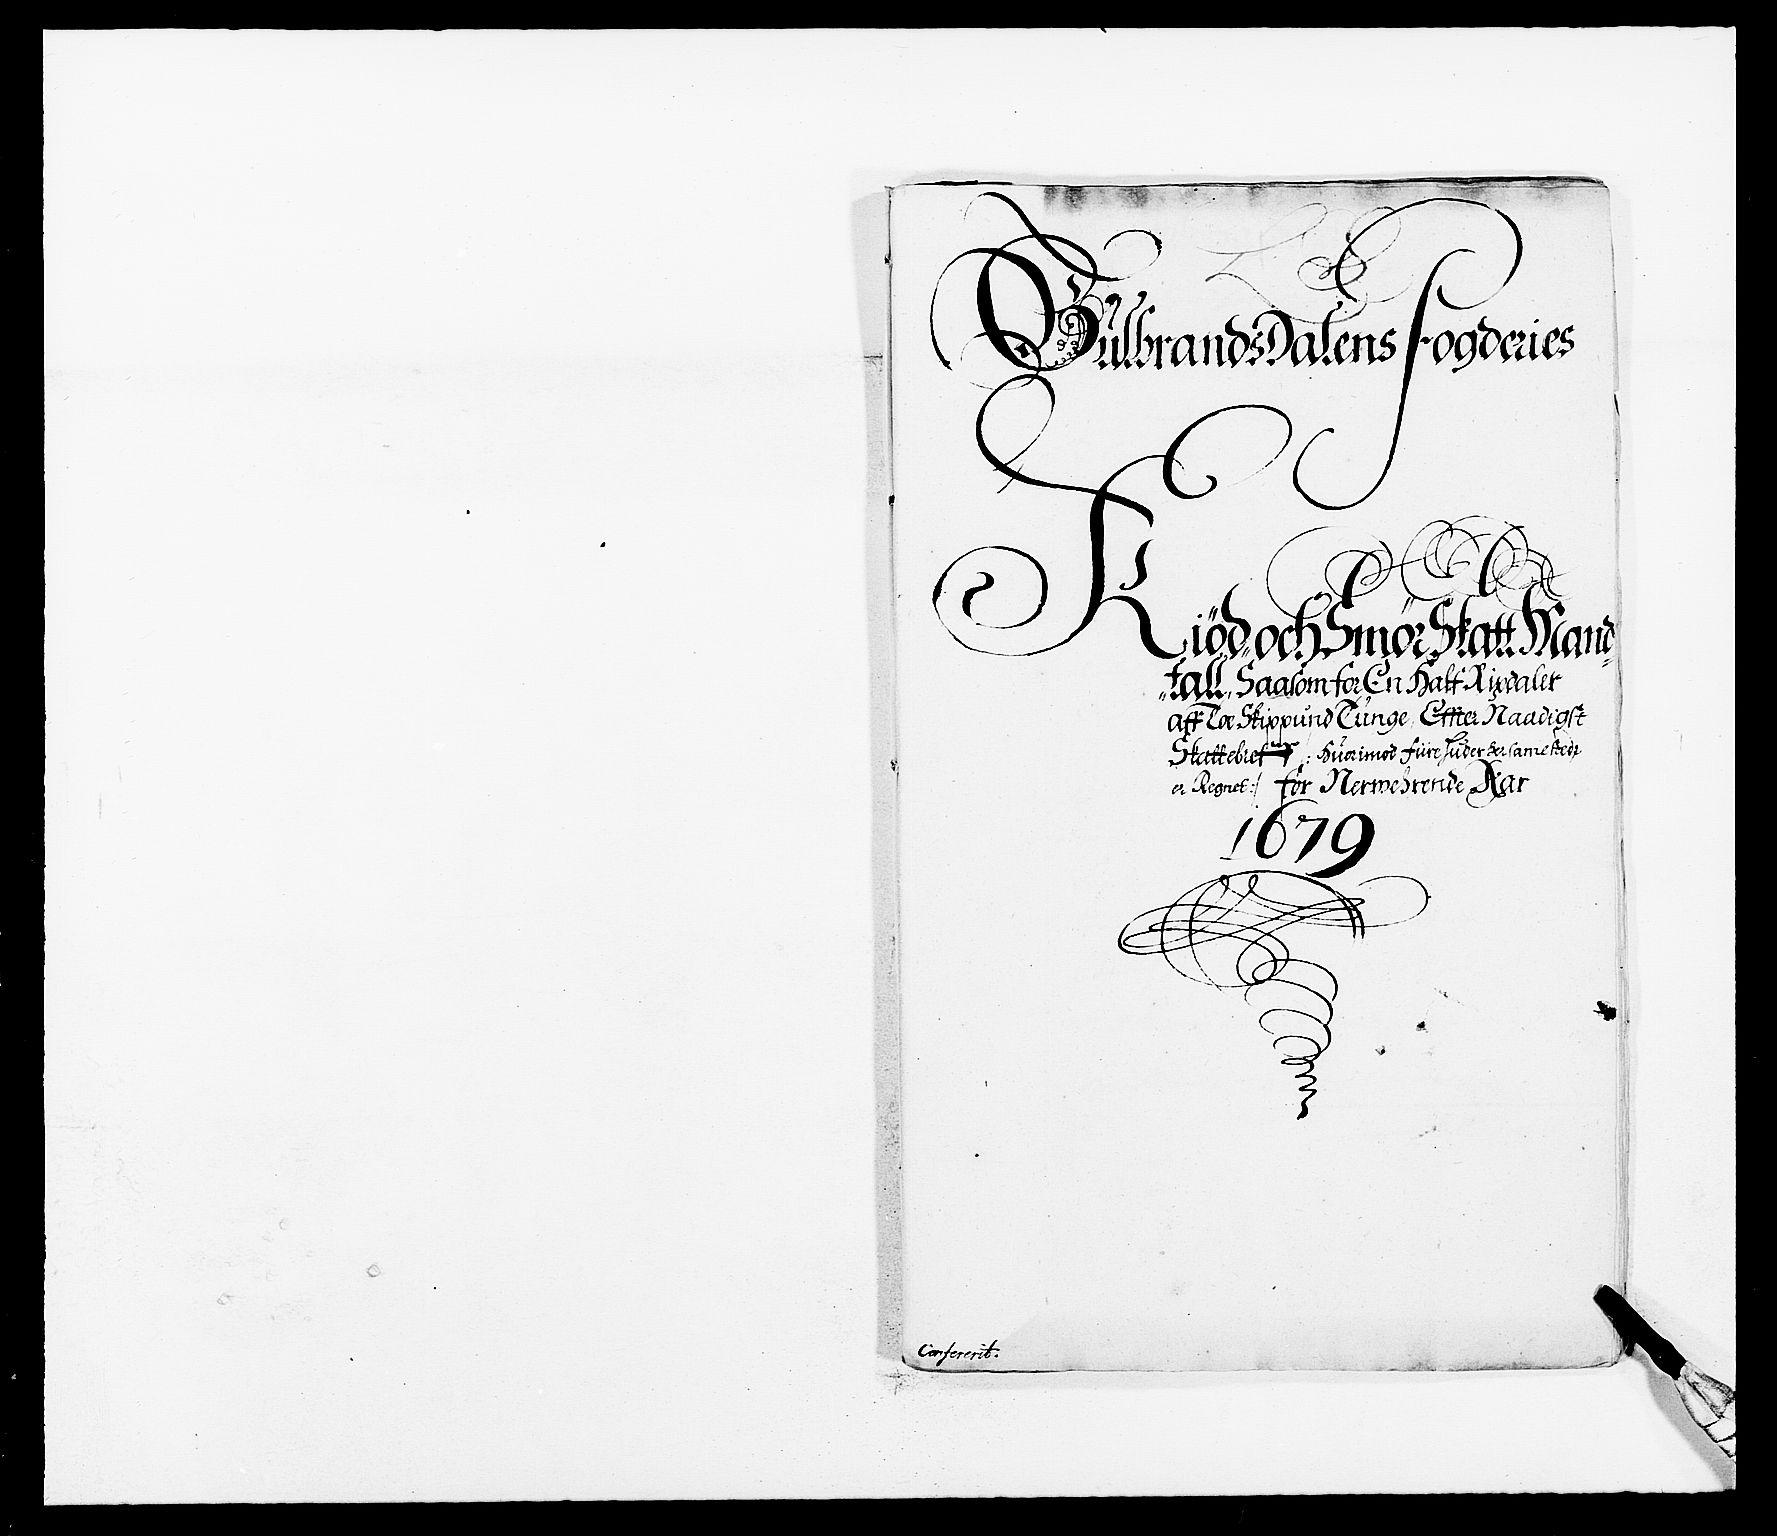 RA, Rentekammeret inntil 1814, Reviderte regnskaper, Fogderegnskap, R17/L1153: Fogderegnskap Gudbrandsdal, 1678-1679, s. 238